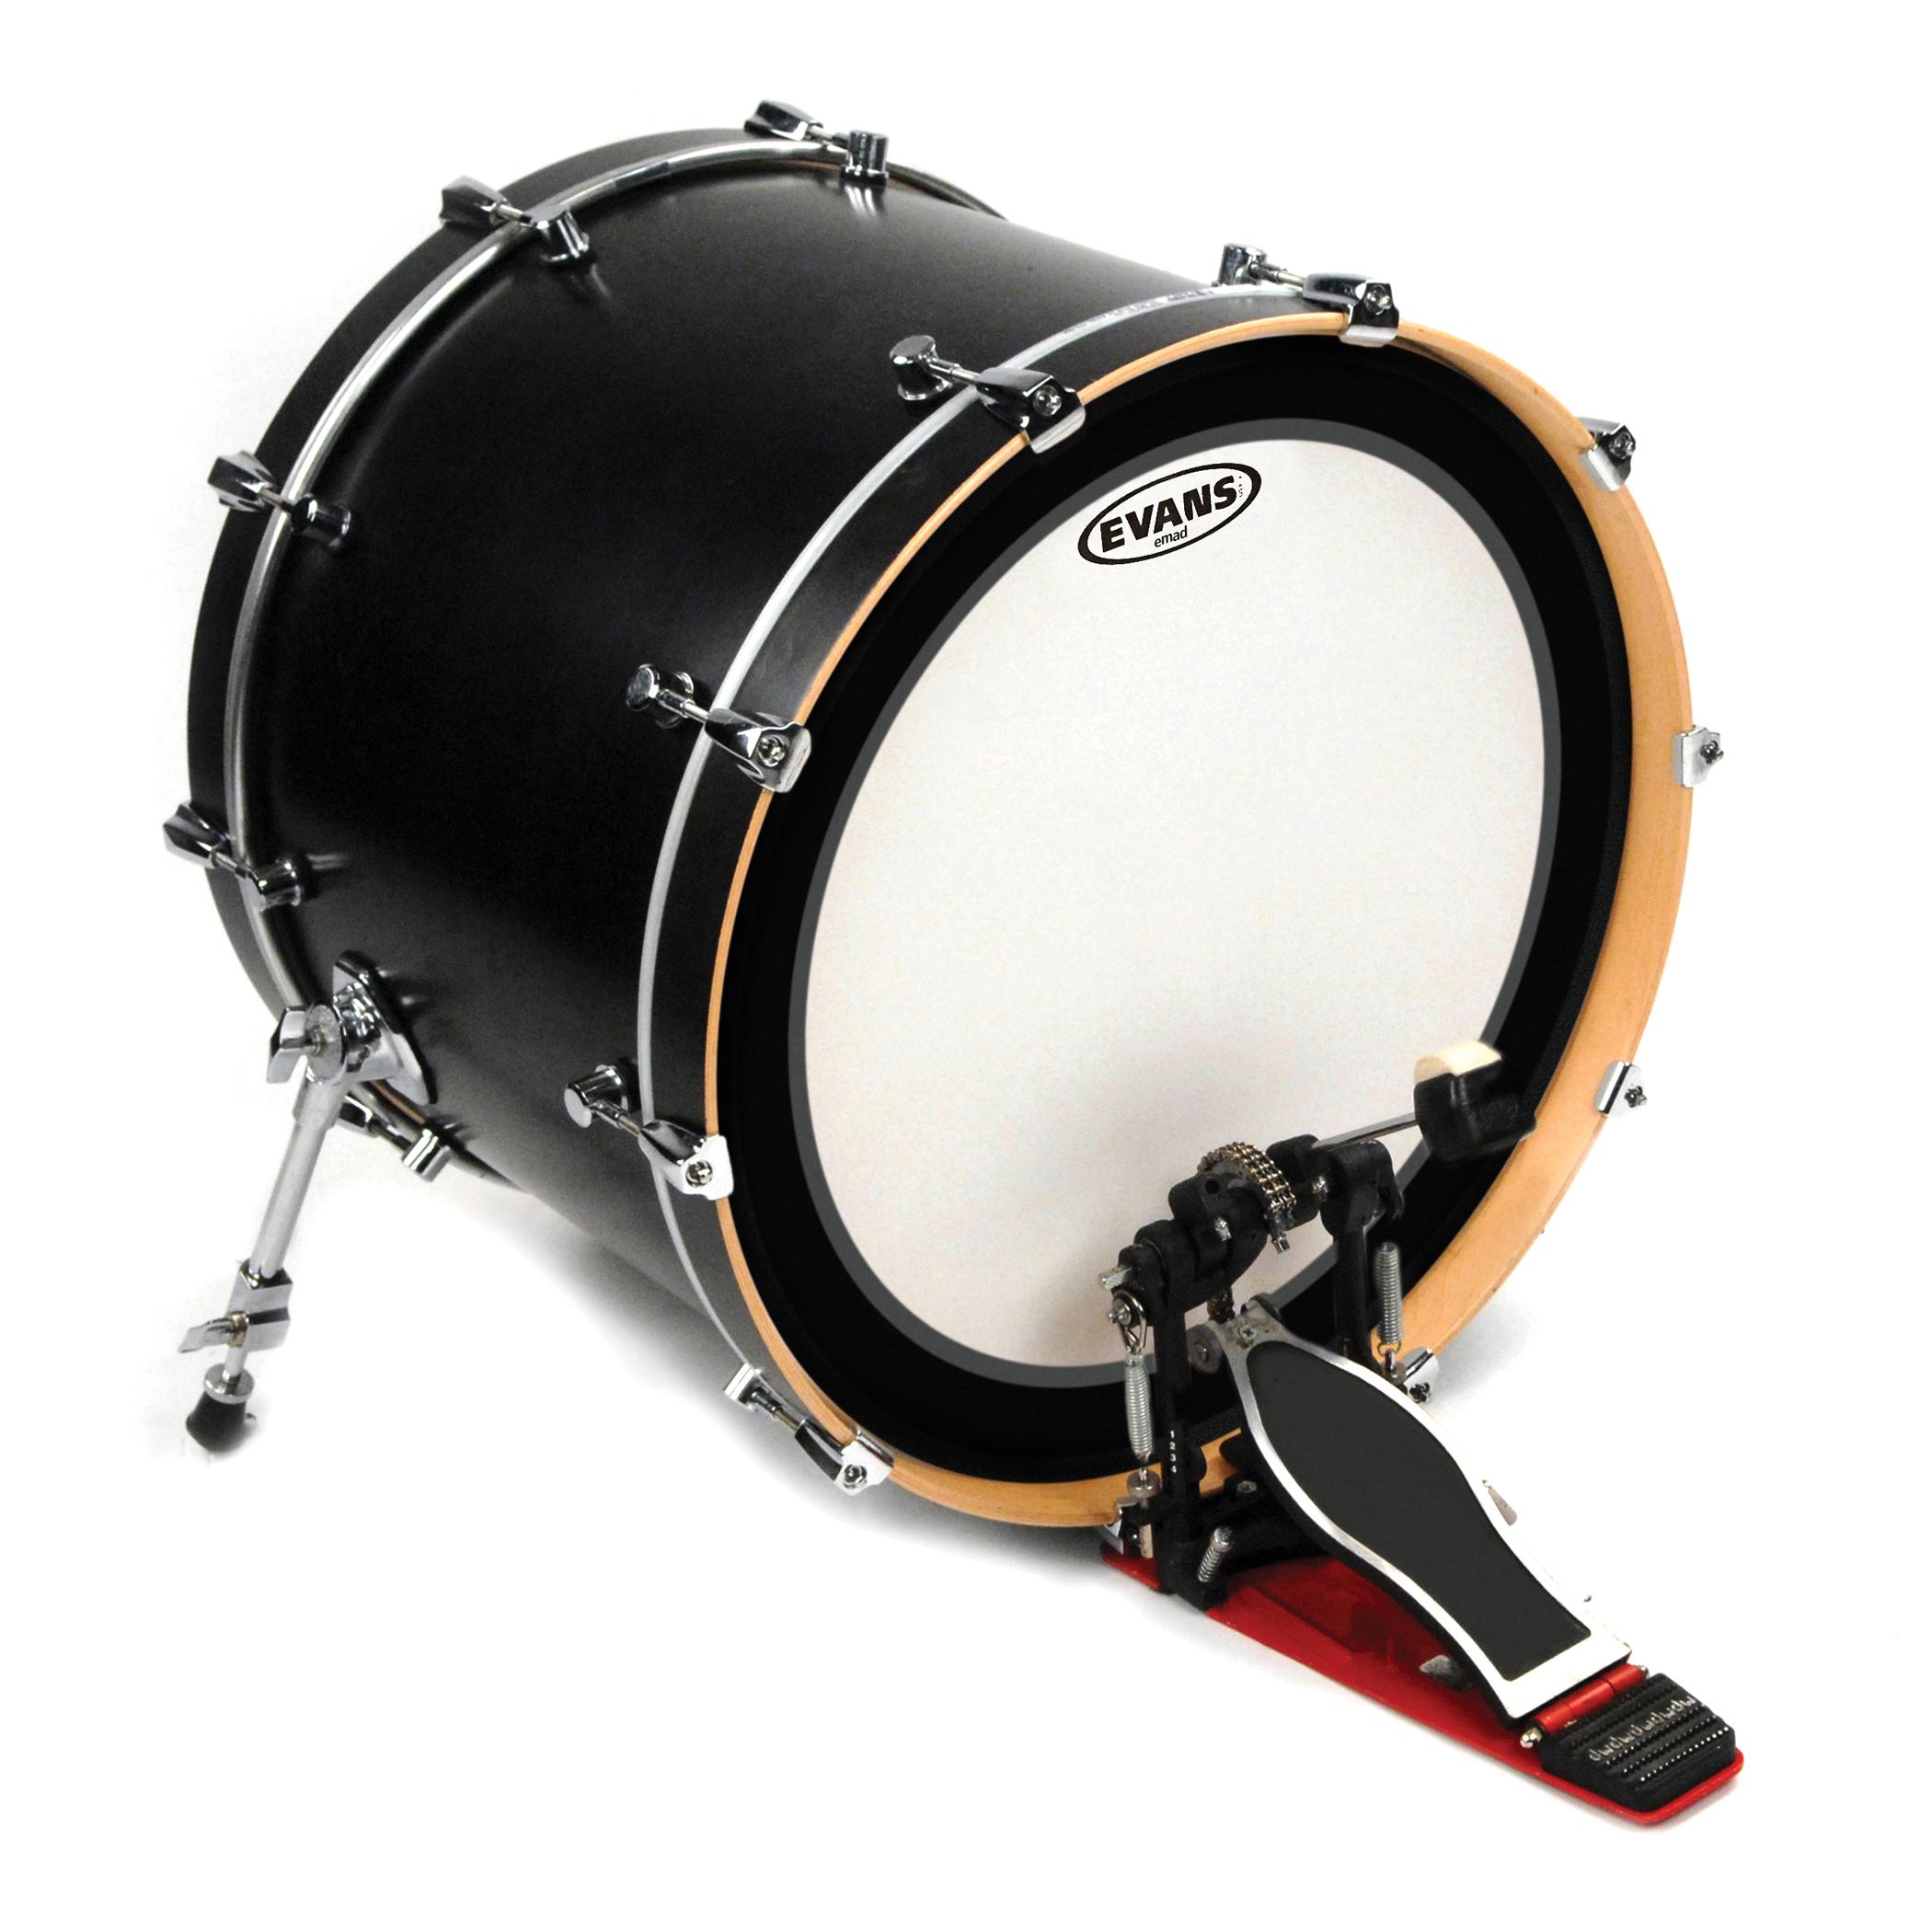 evans emad coated white bass drum head 18 just drums. Black Bedroom Furniture Sets. Home Design Ideas